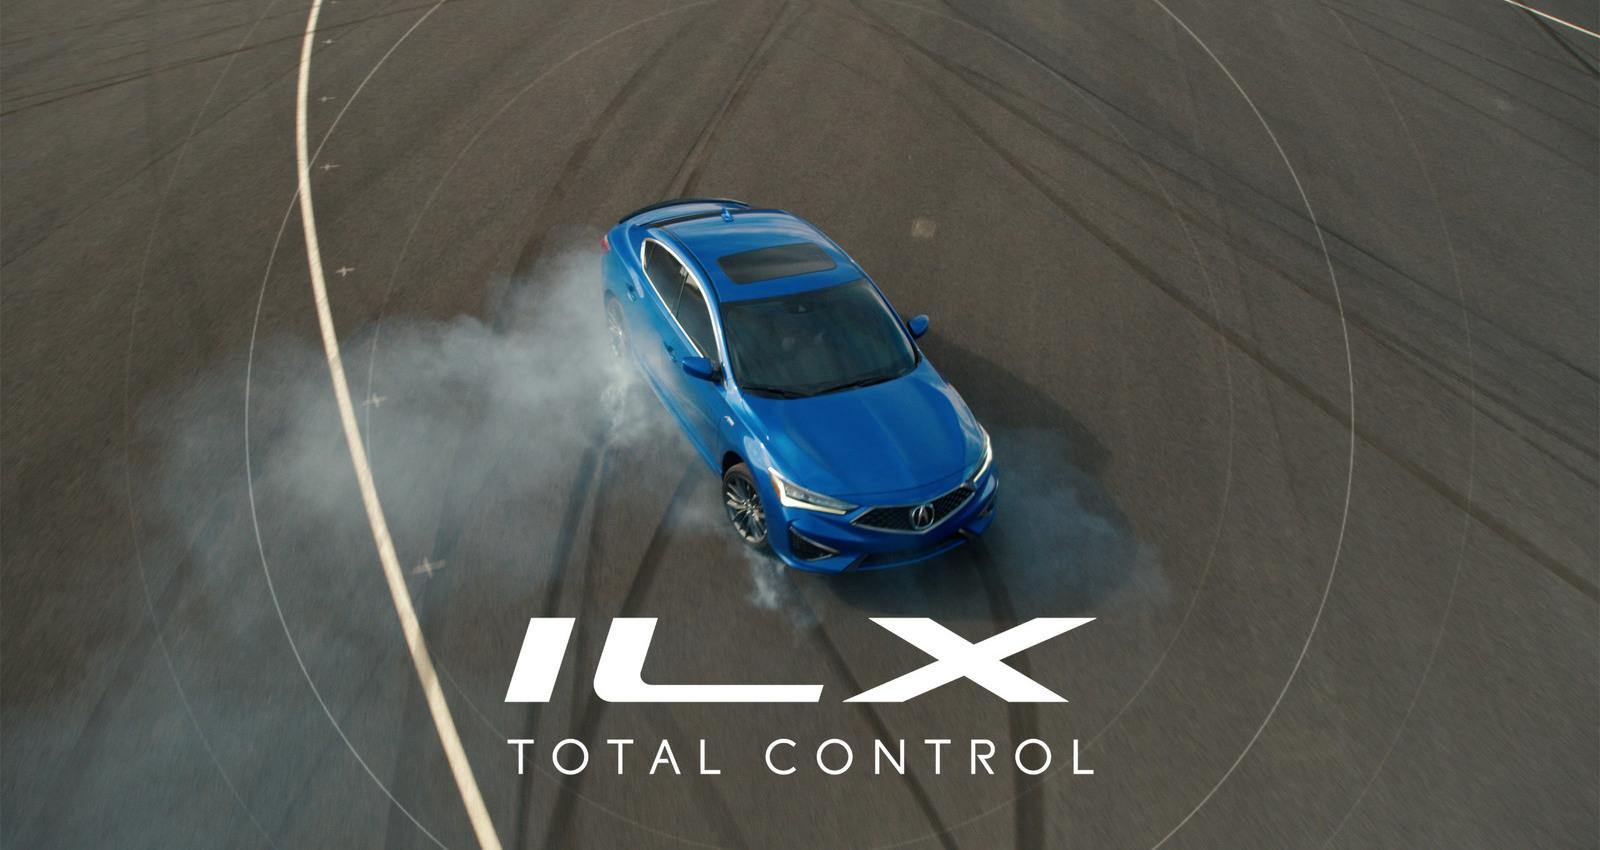 ILX Total Control